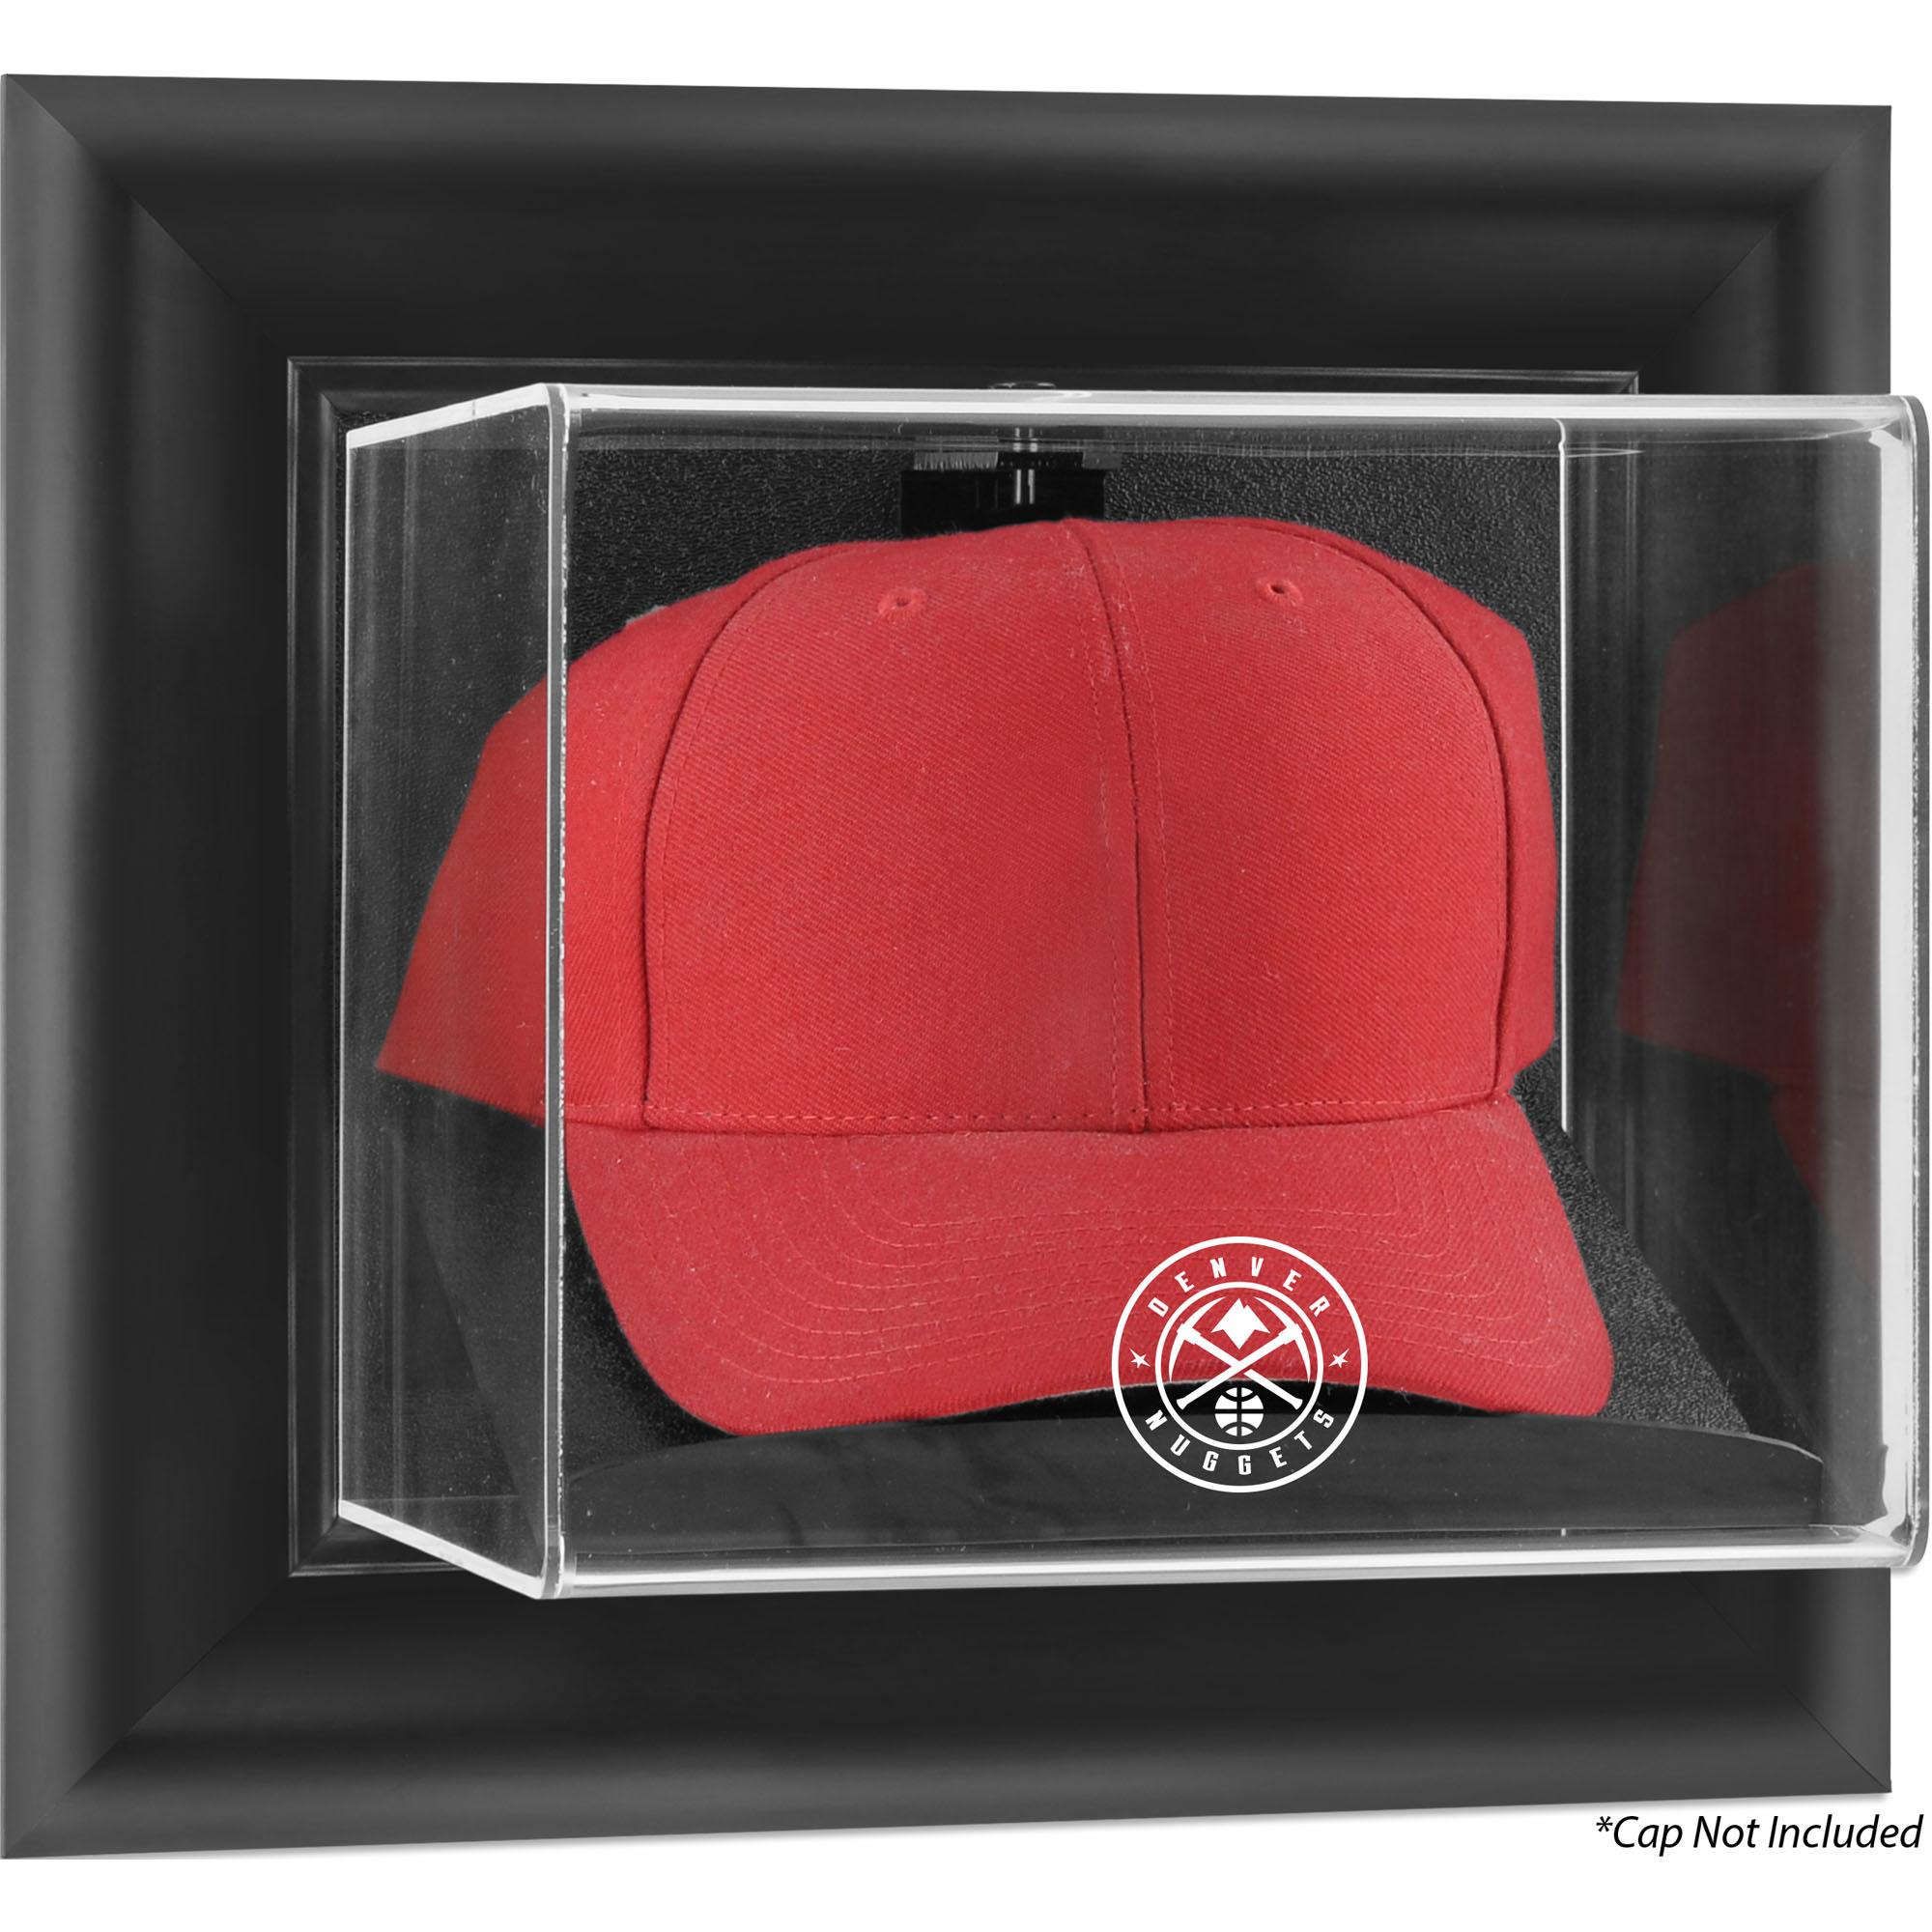 Denver Nuggets Fanatics Authentic Framed Black Wall-Mountable Cap Display Case